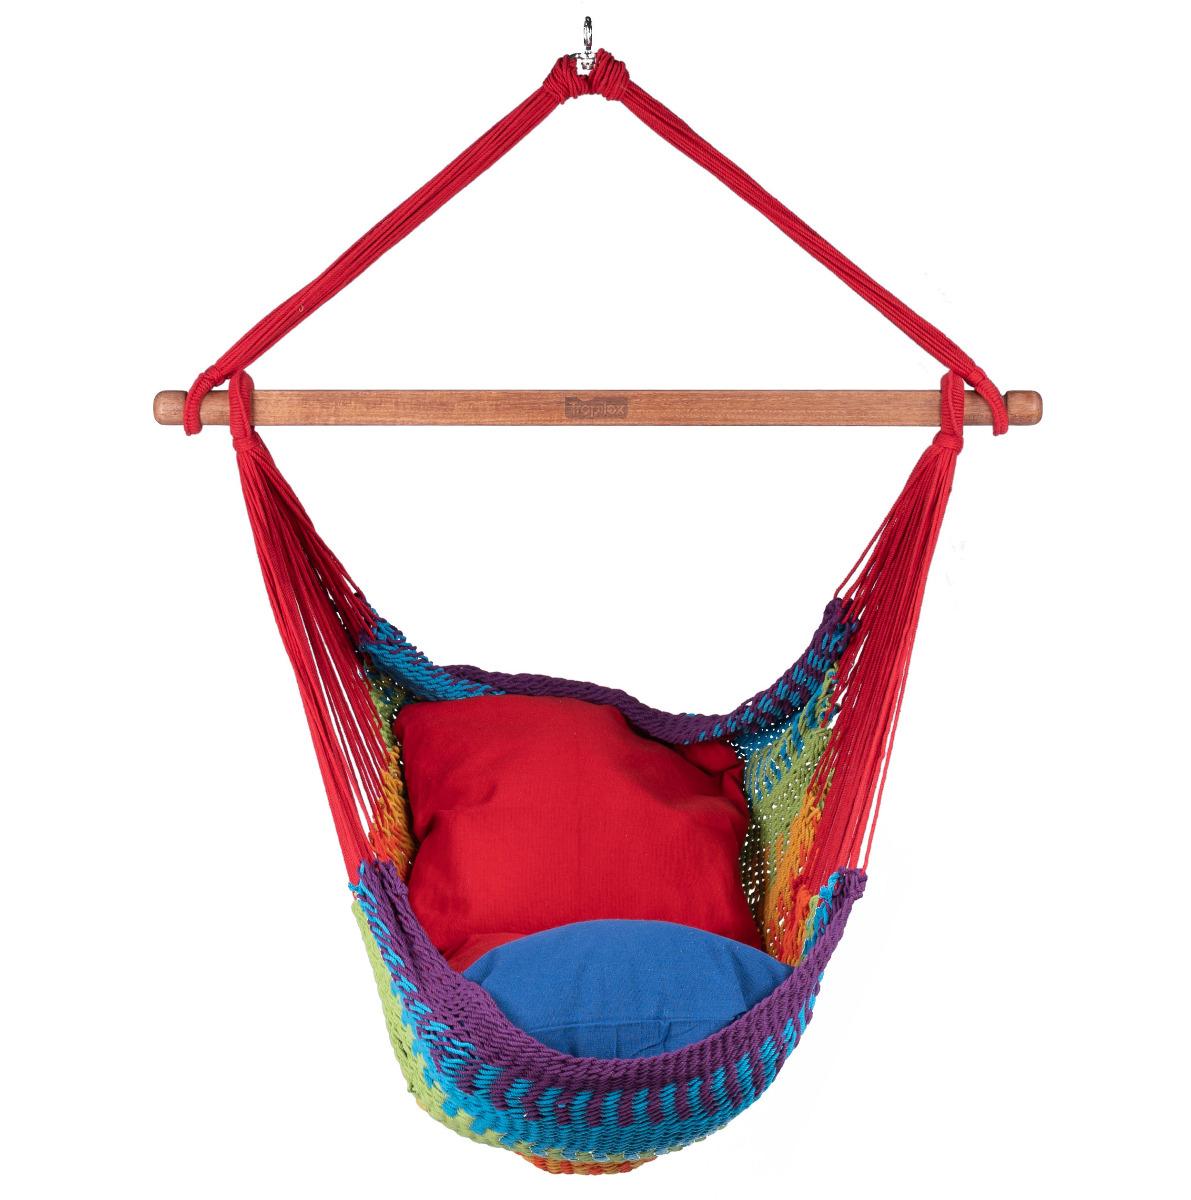 'Mexico' Rainbow Hangstoel - Veelkleurig - Tropilex �